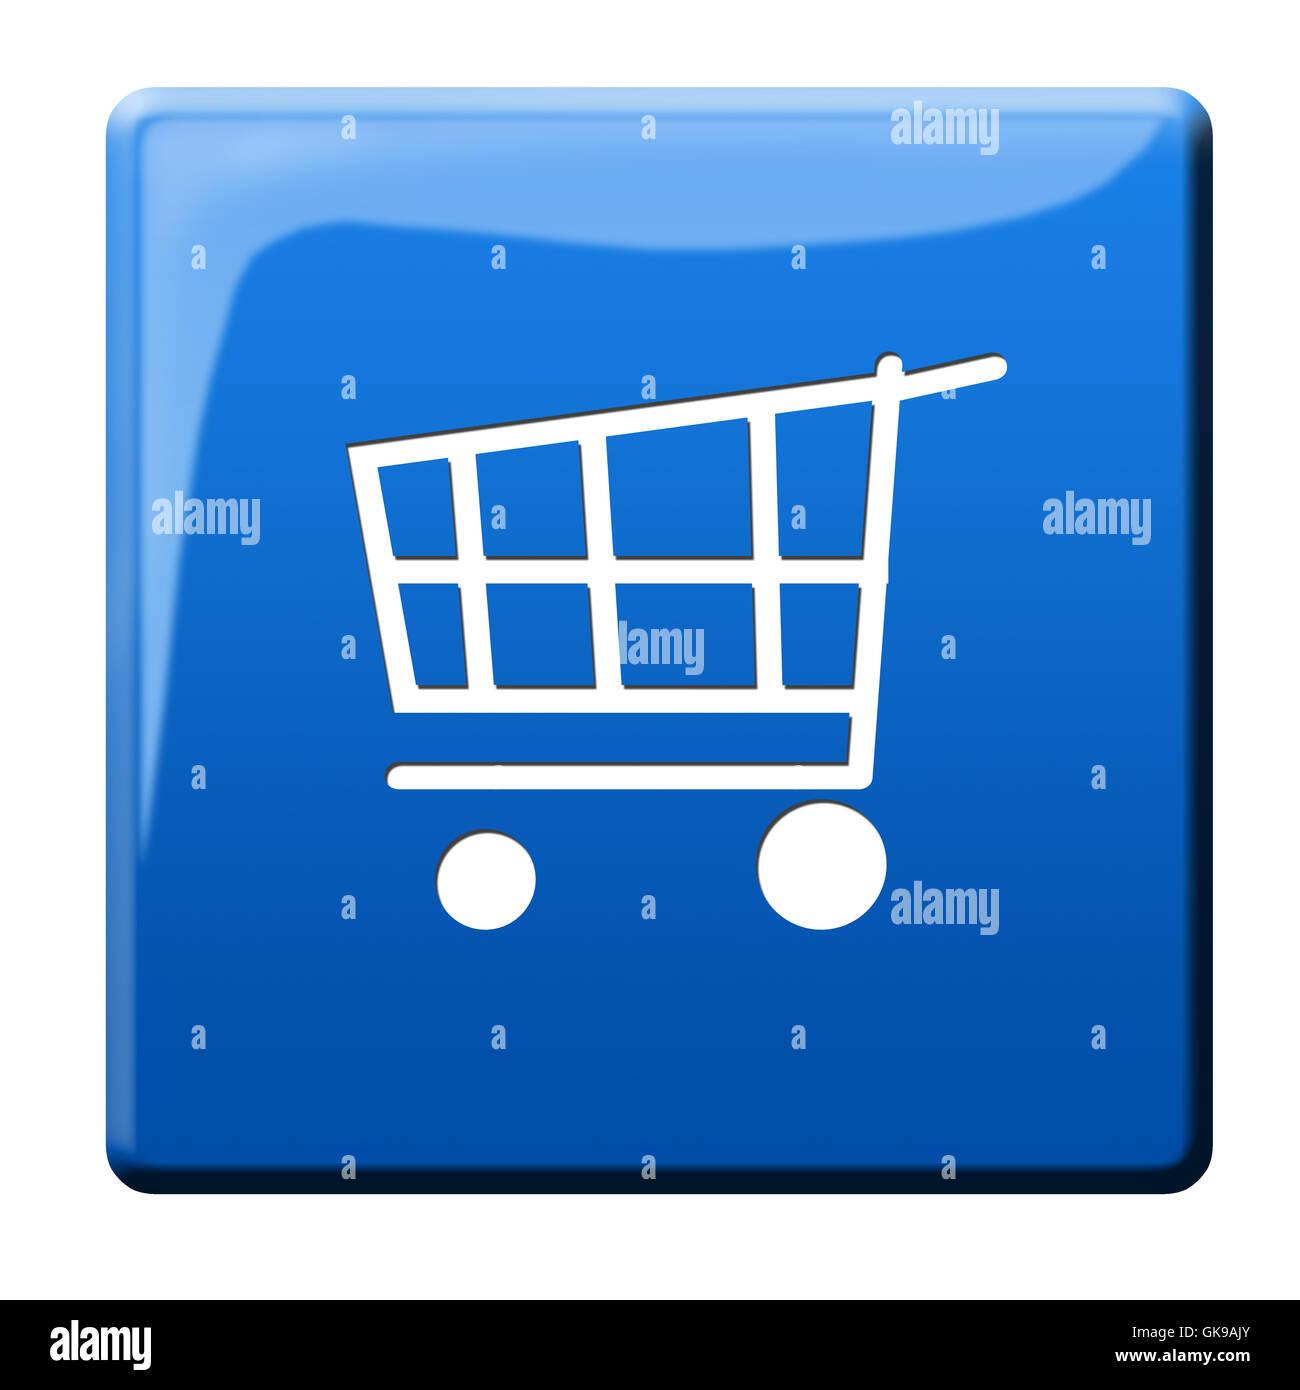 Trolley-Warenkorb-Symbolik Stockbild